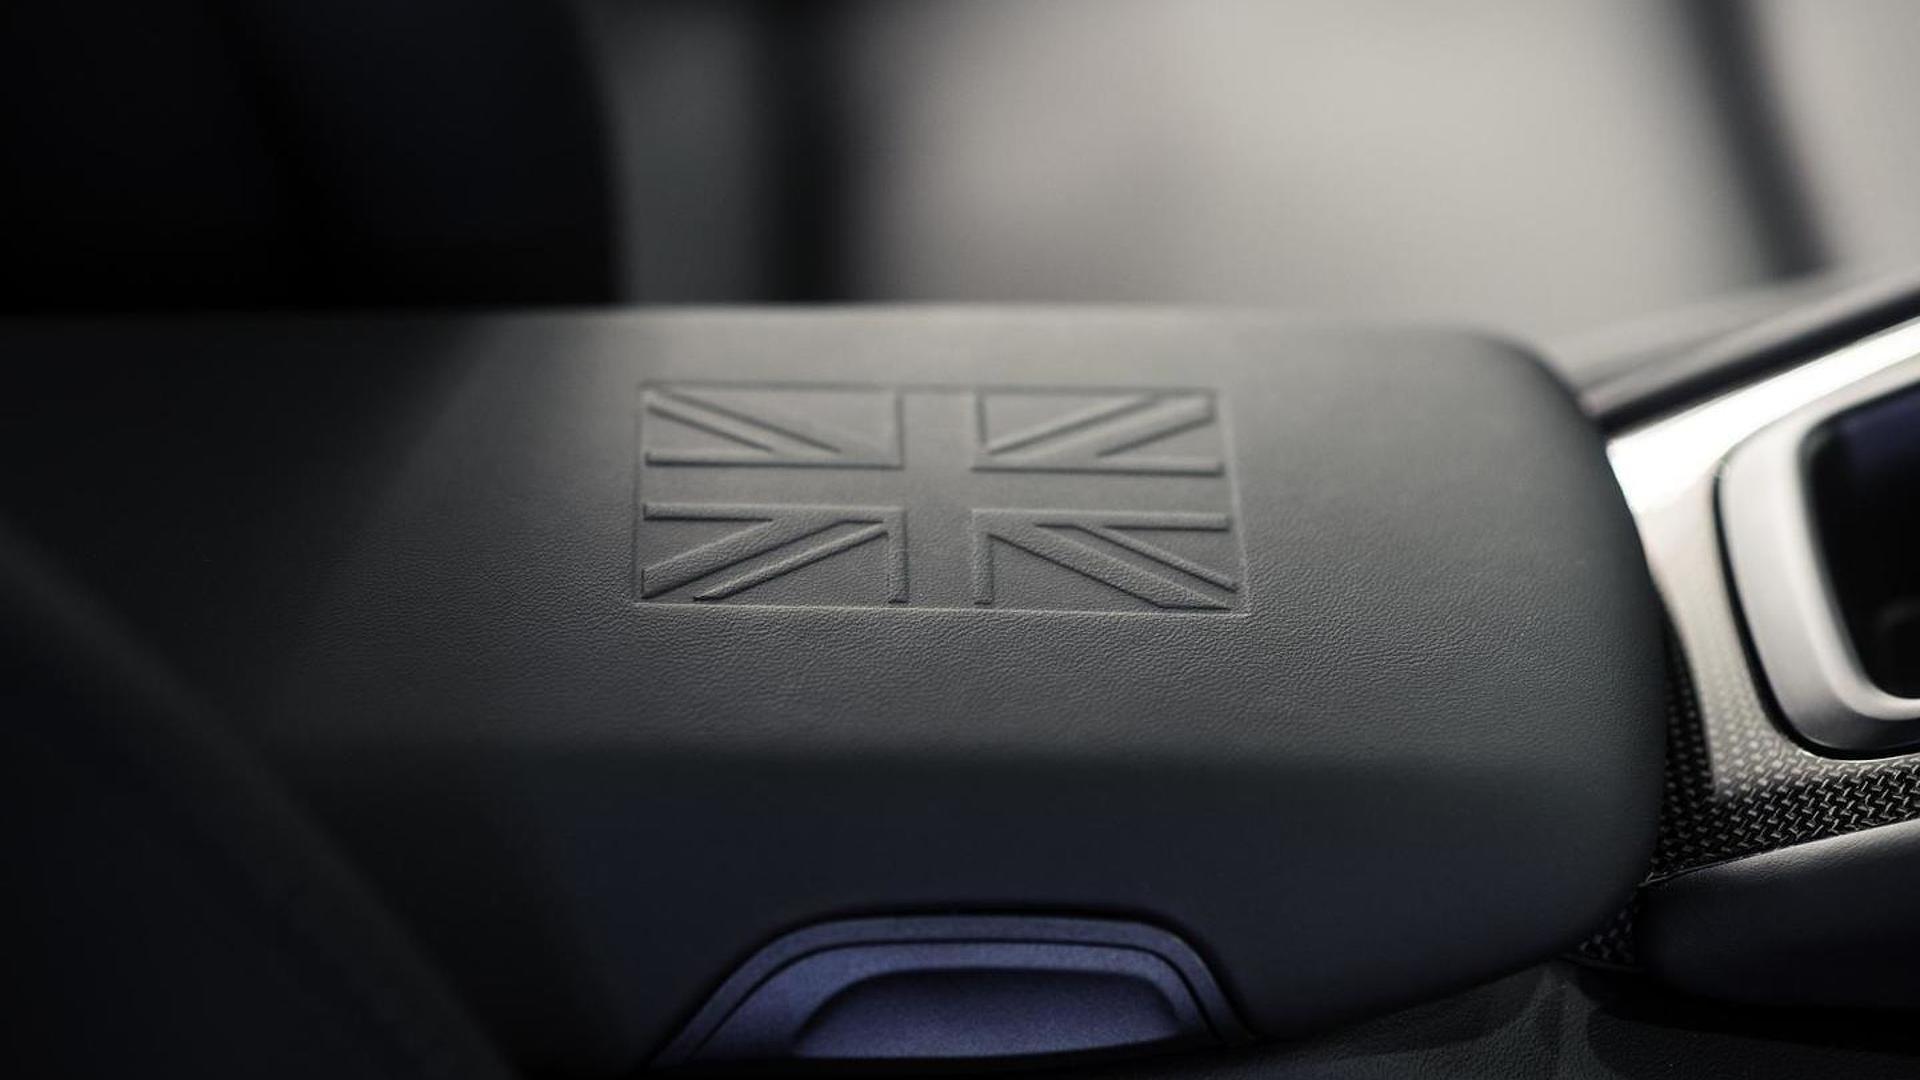 Тиснение флага Великобритании на кожаном подлокотнике